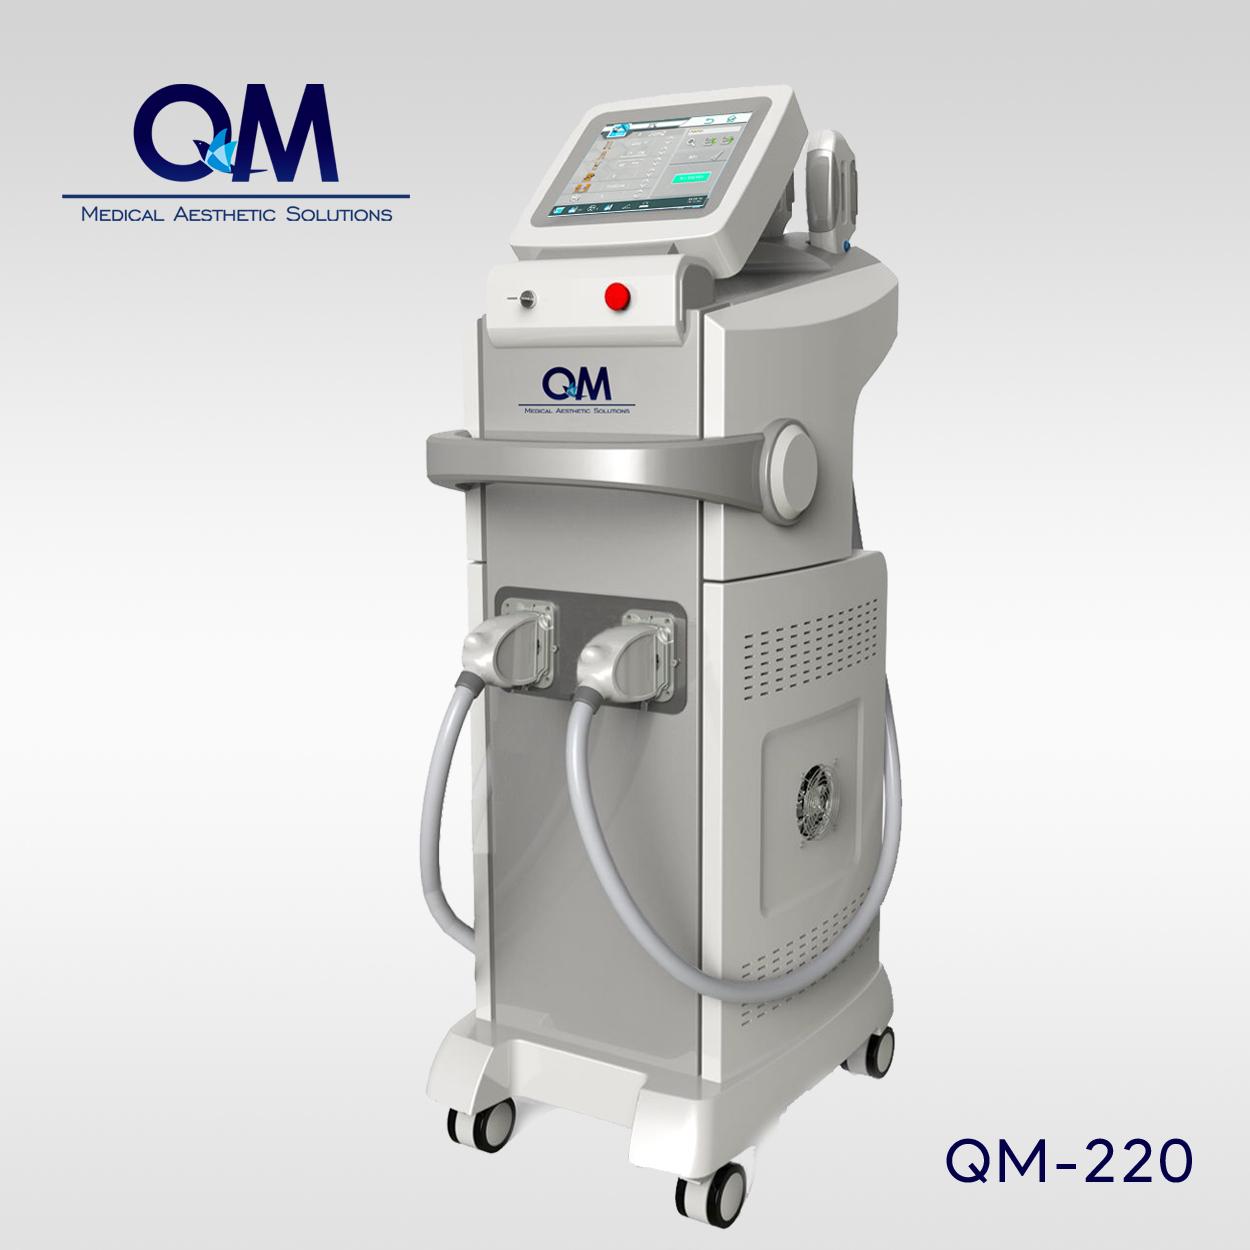 QM-220